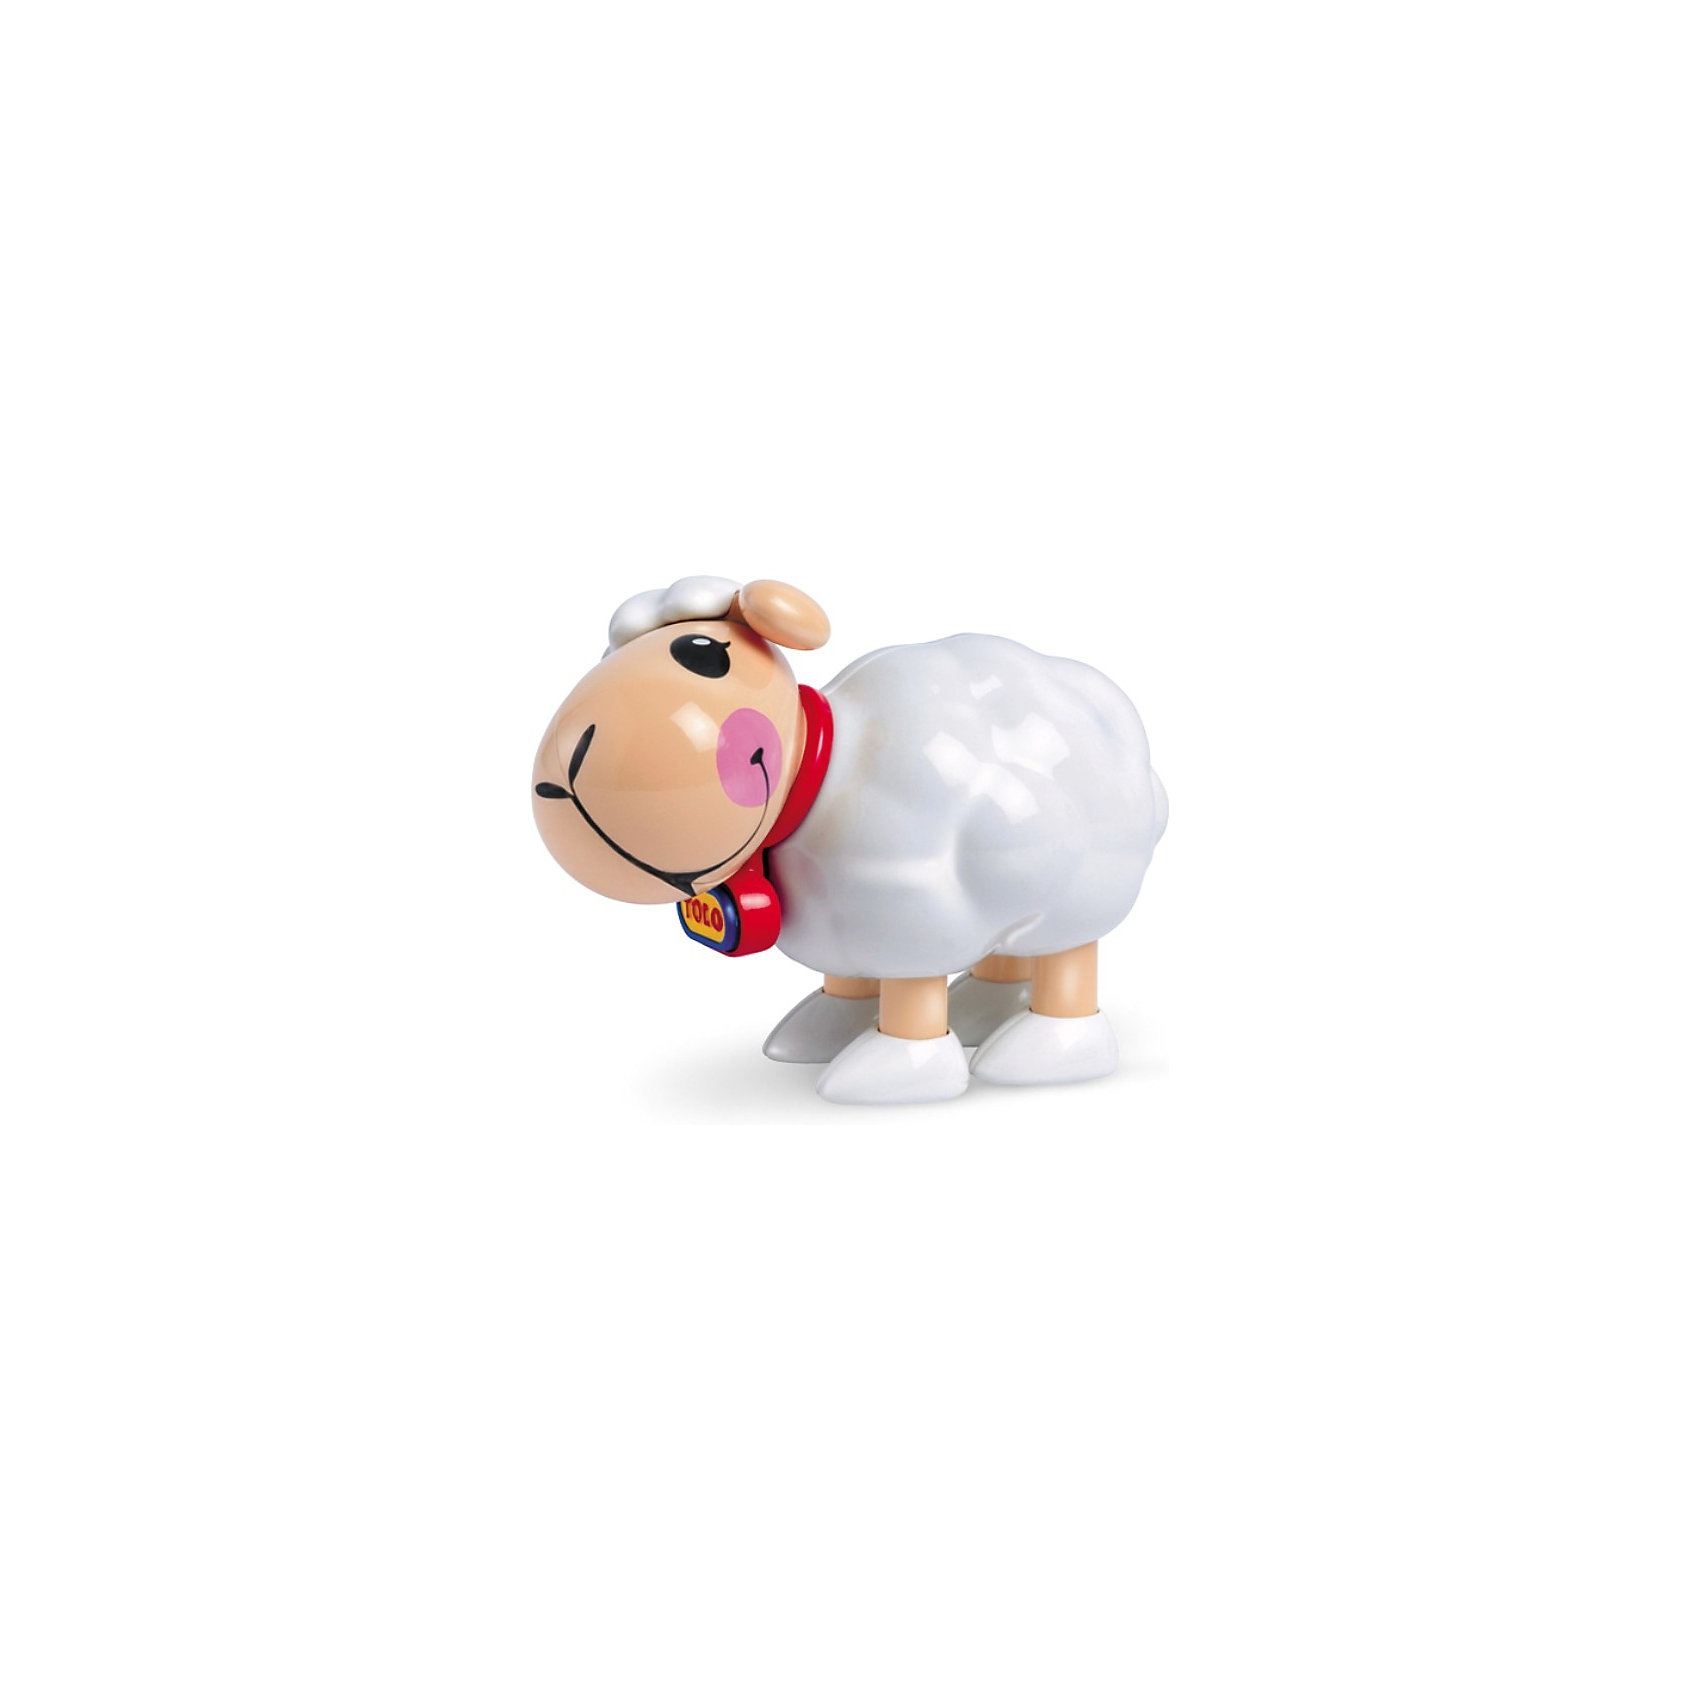 TOLO Фигурка Овечка, Первые друзья, TOLO развивающие игрушки tolo toys тюлень